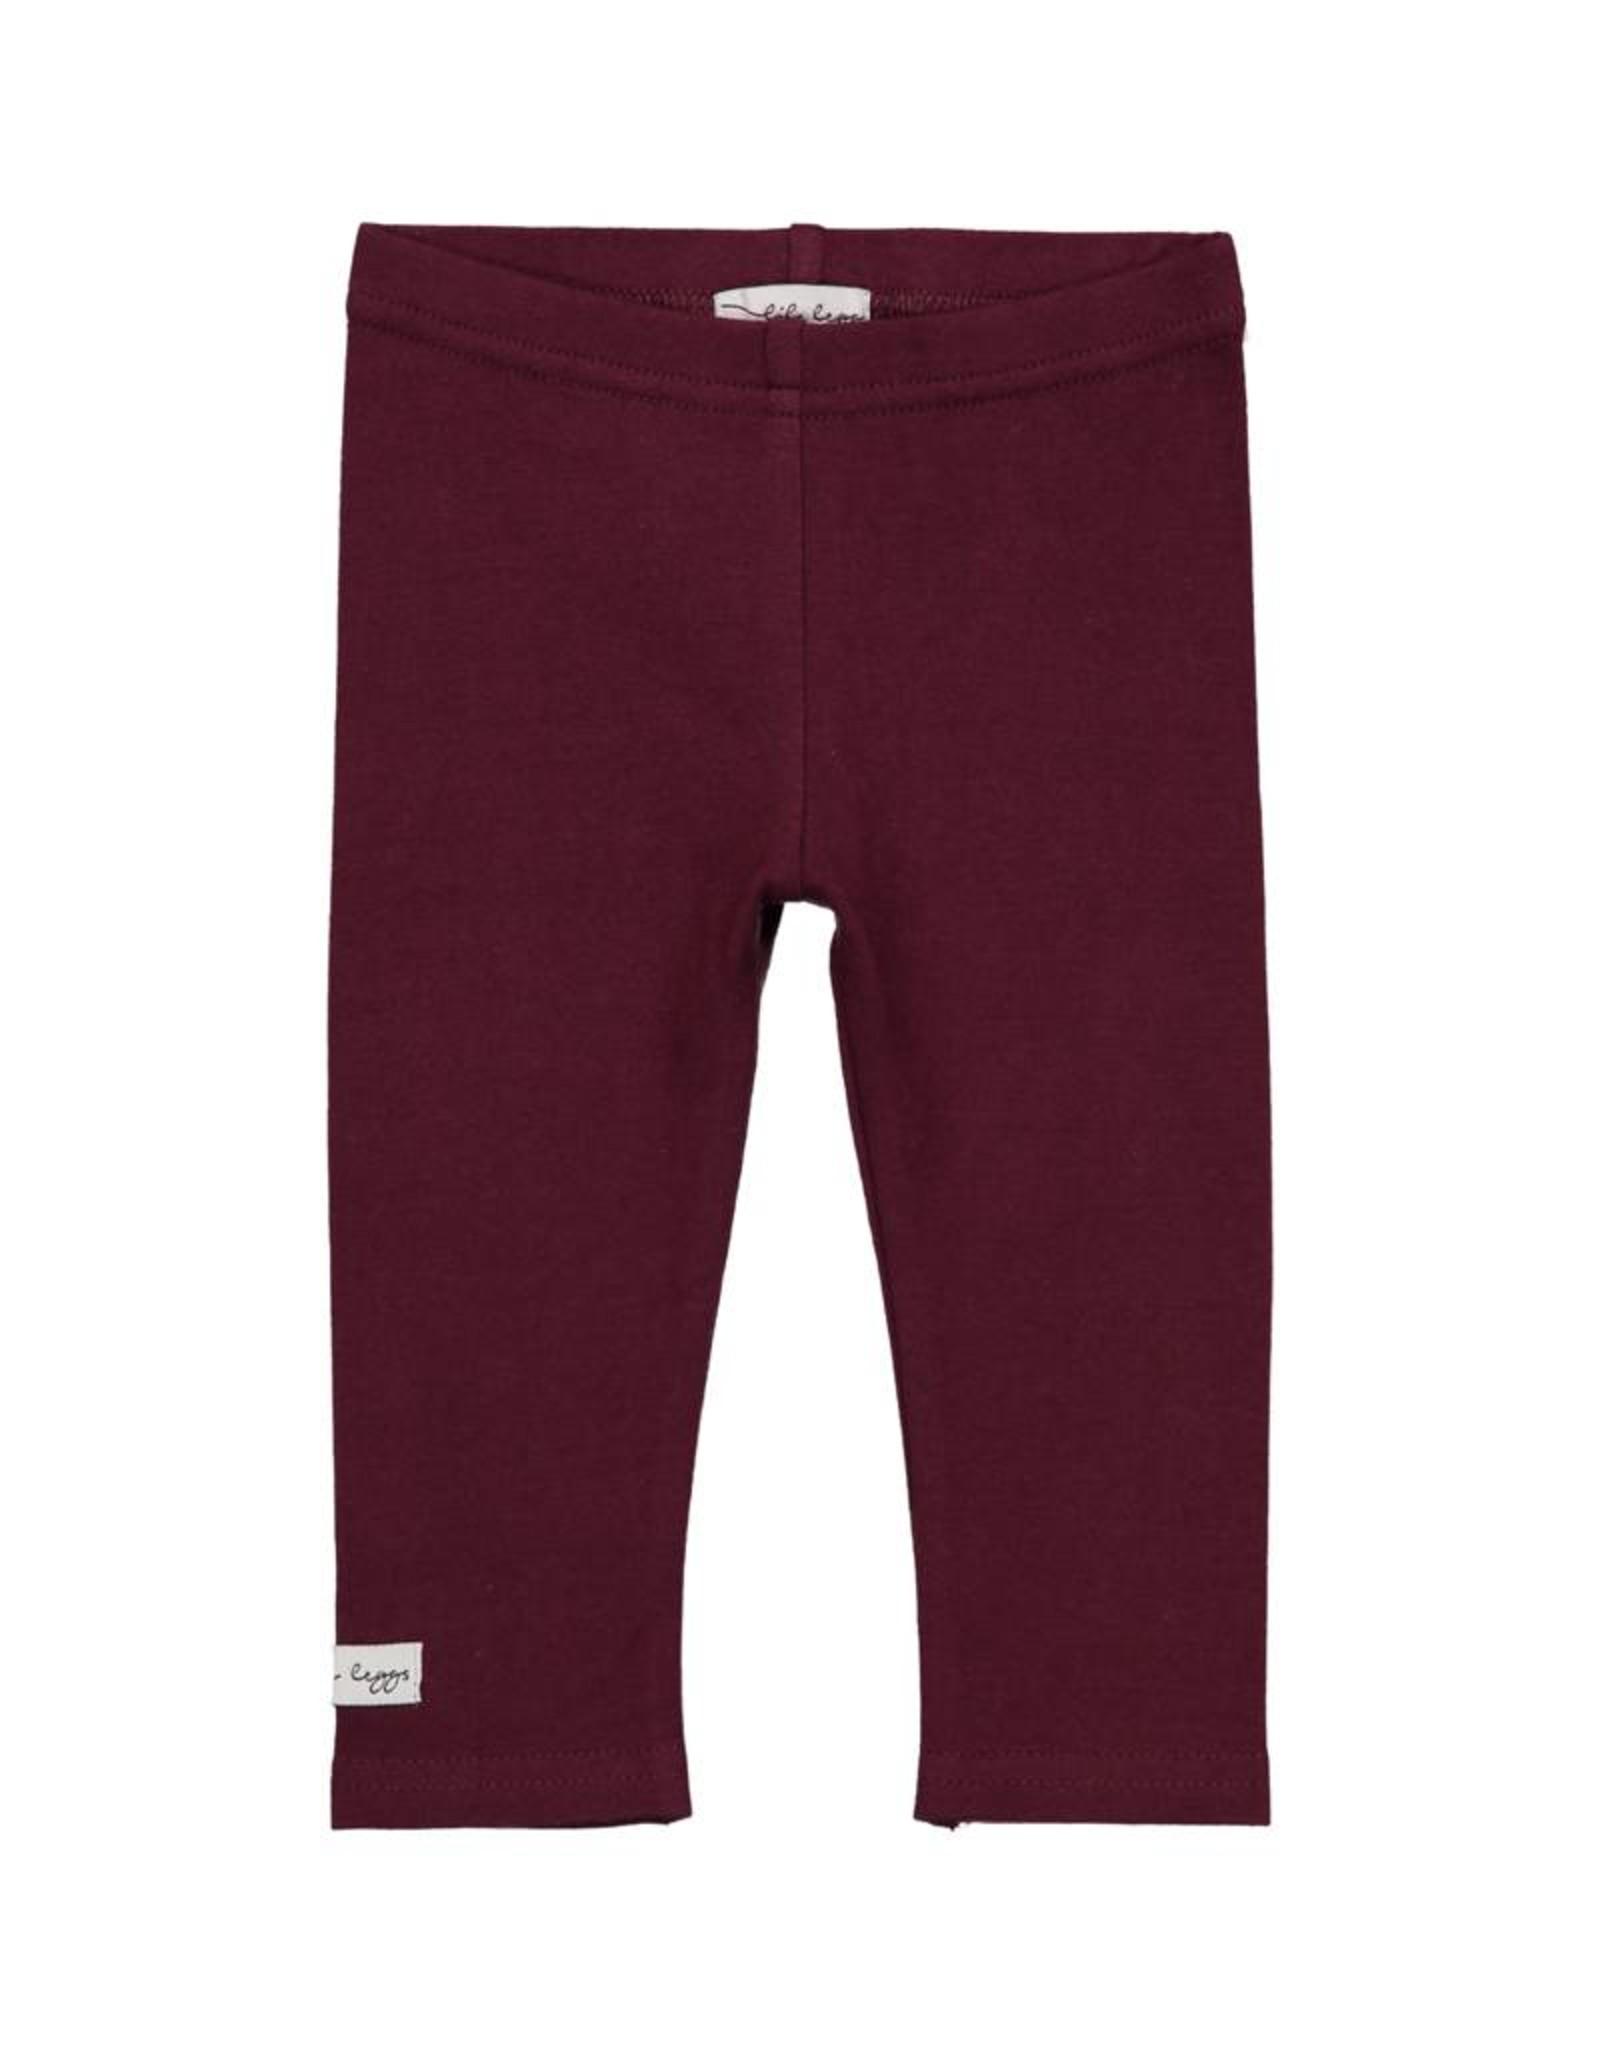 LIL LEGS FW Cotton Leggings Fashion Colors